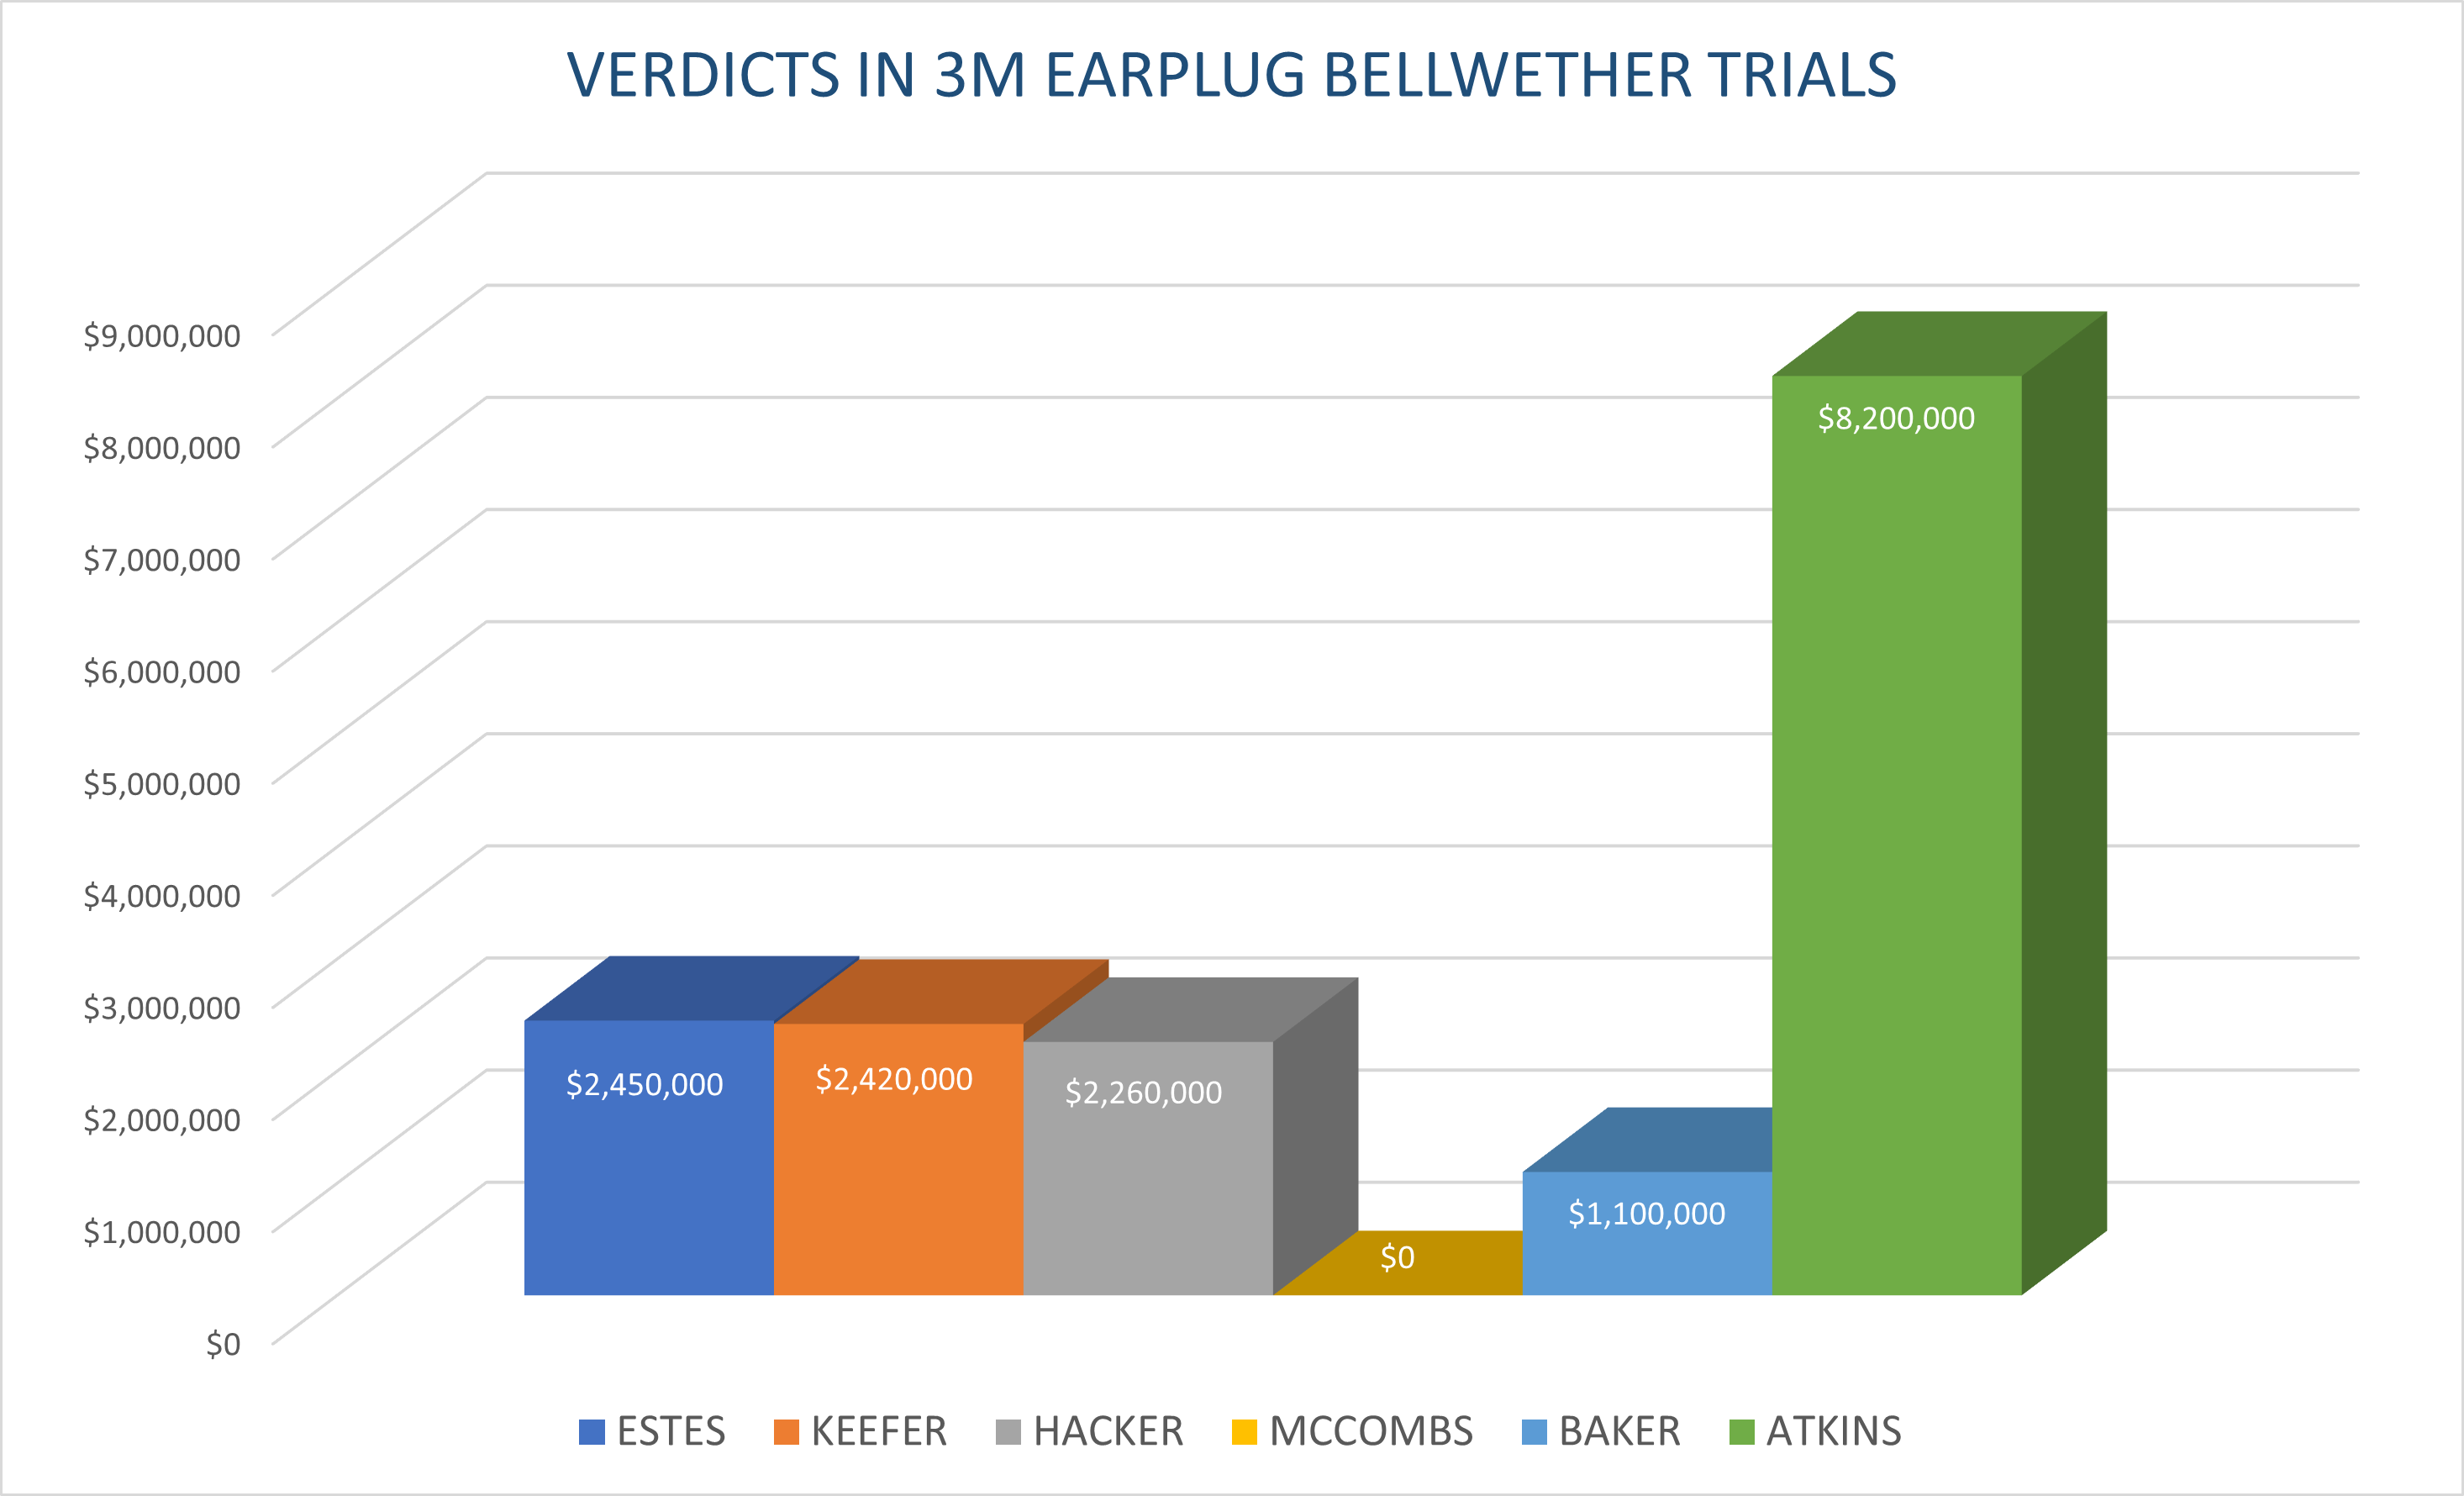 3m earplug verdicts